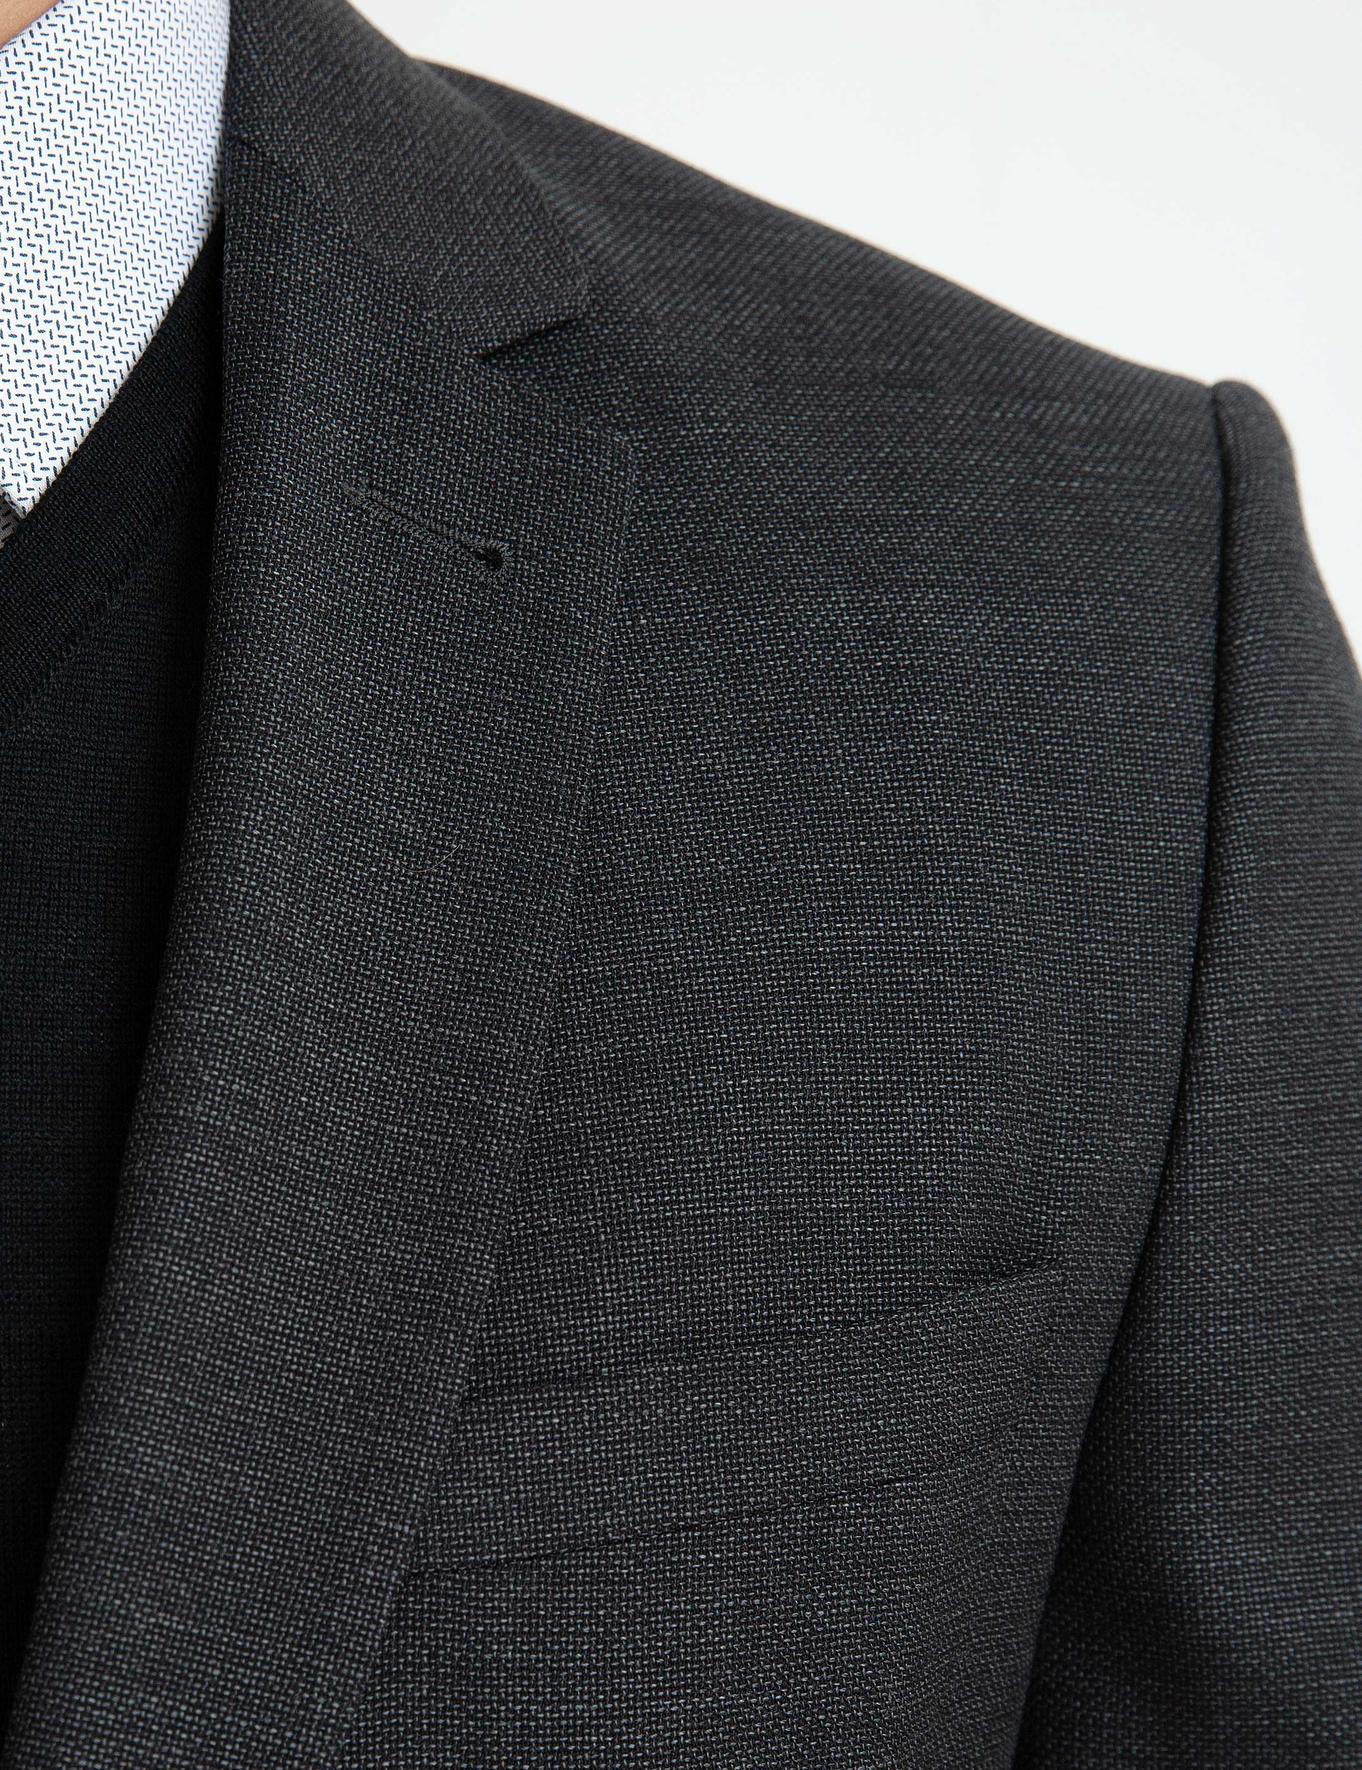 Antrasit Slim Fit Takım Elbise - 50192599001